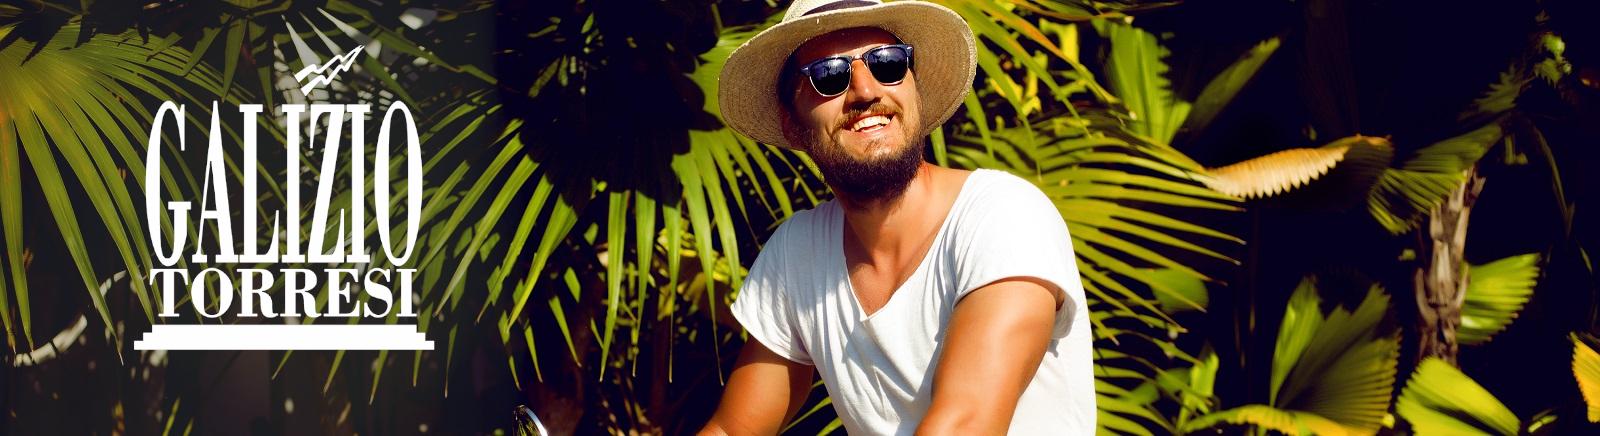 Gisy: Galizio Torresi Herrenschuhe online shoppen